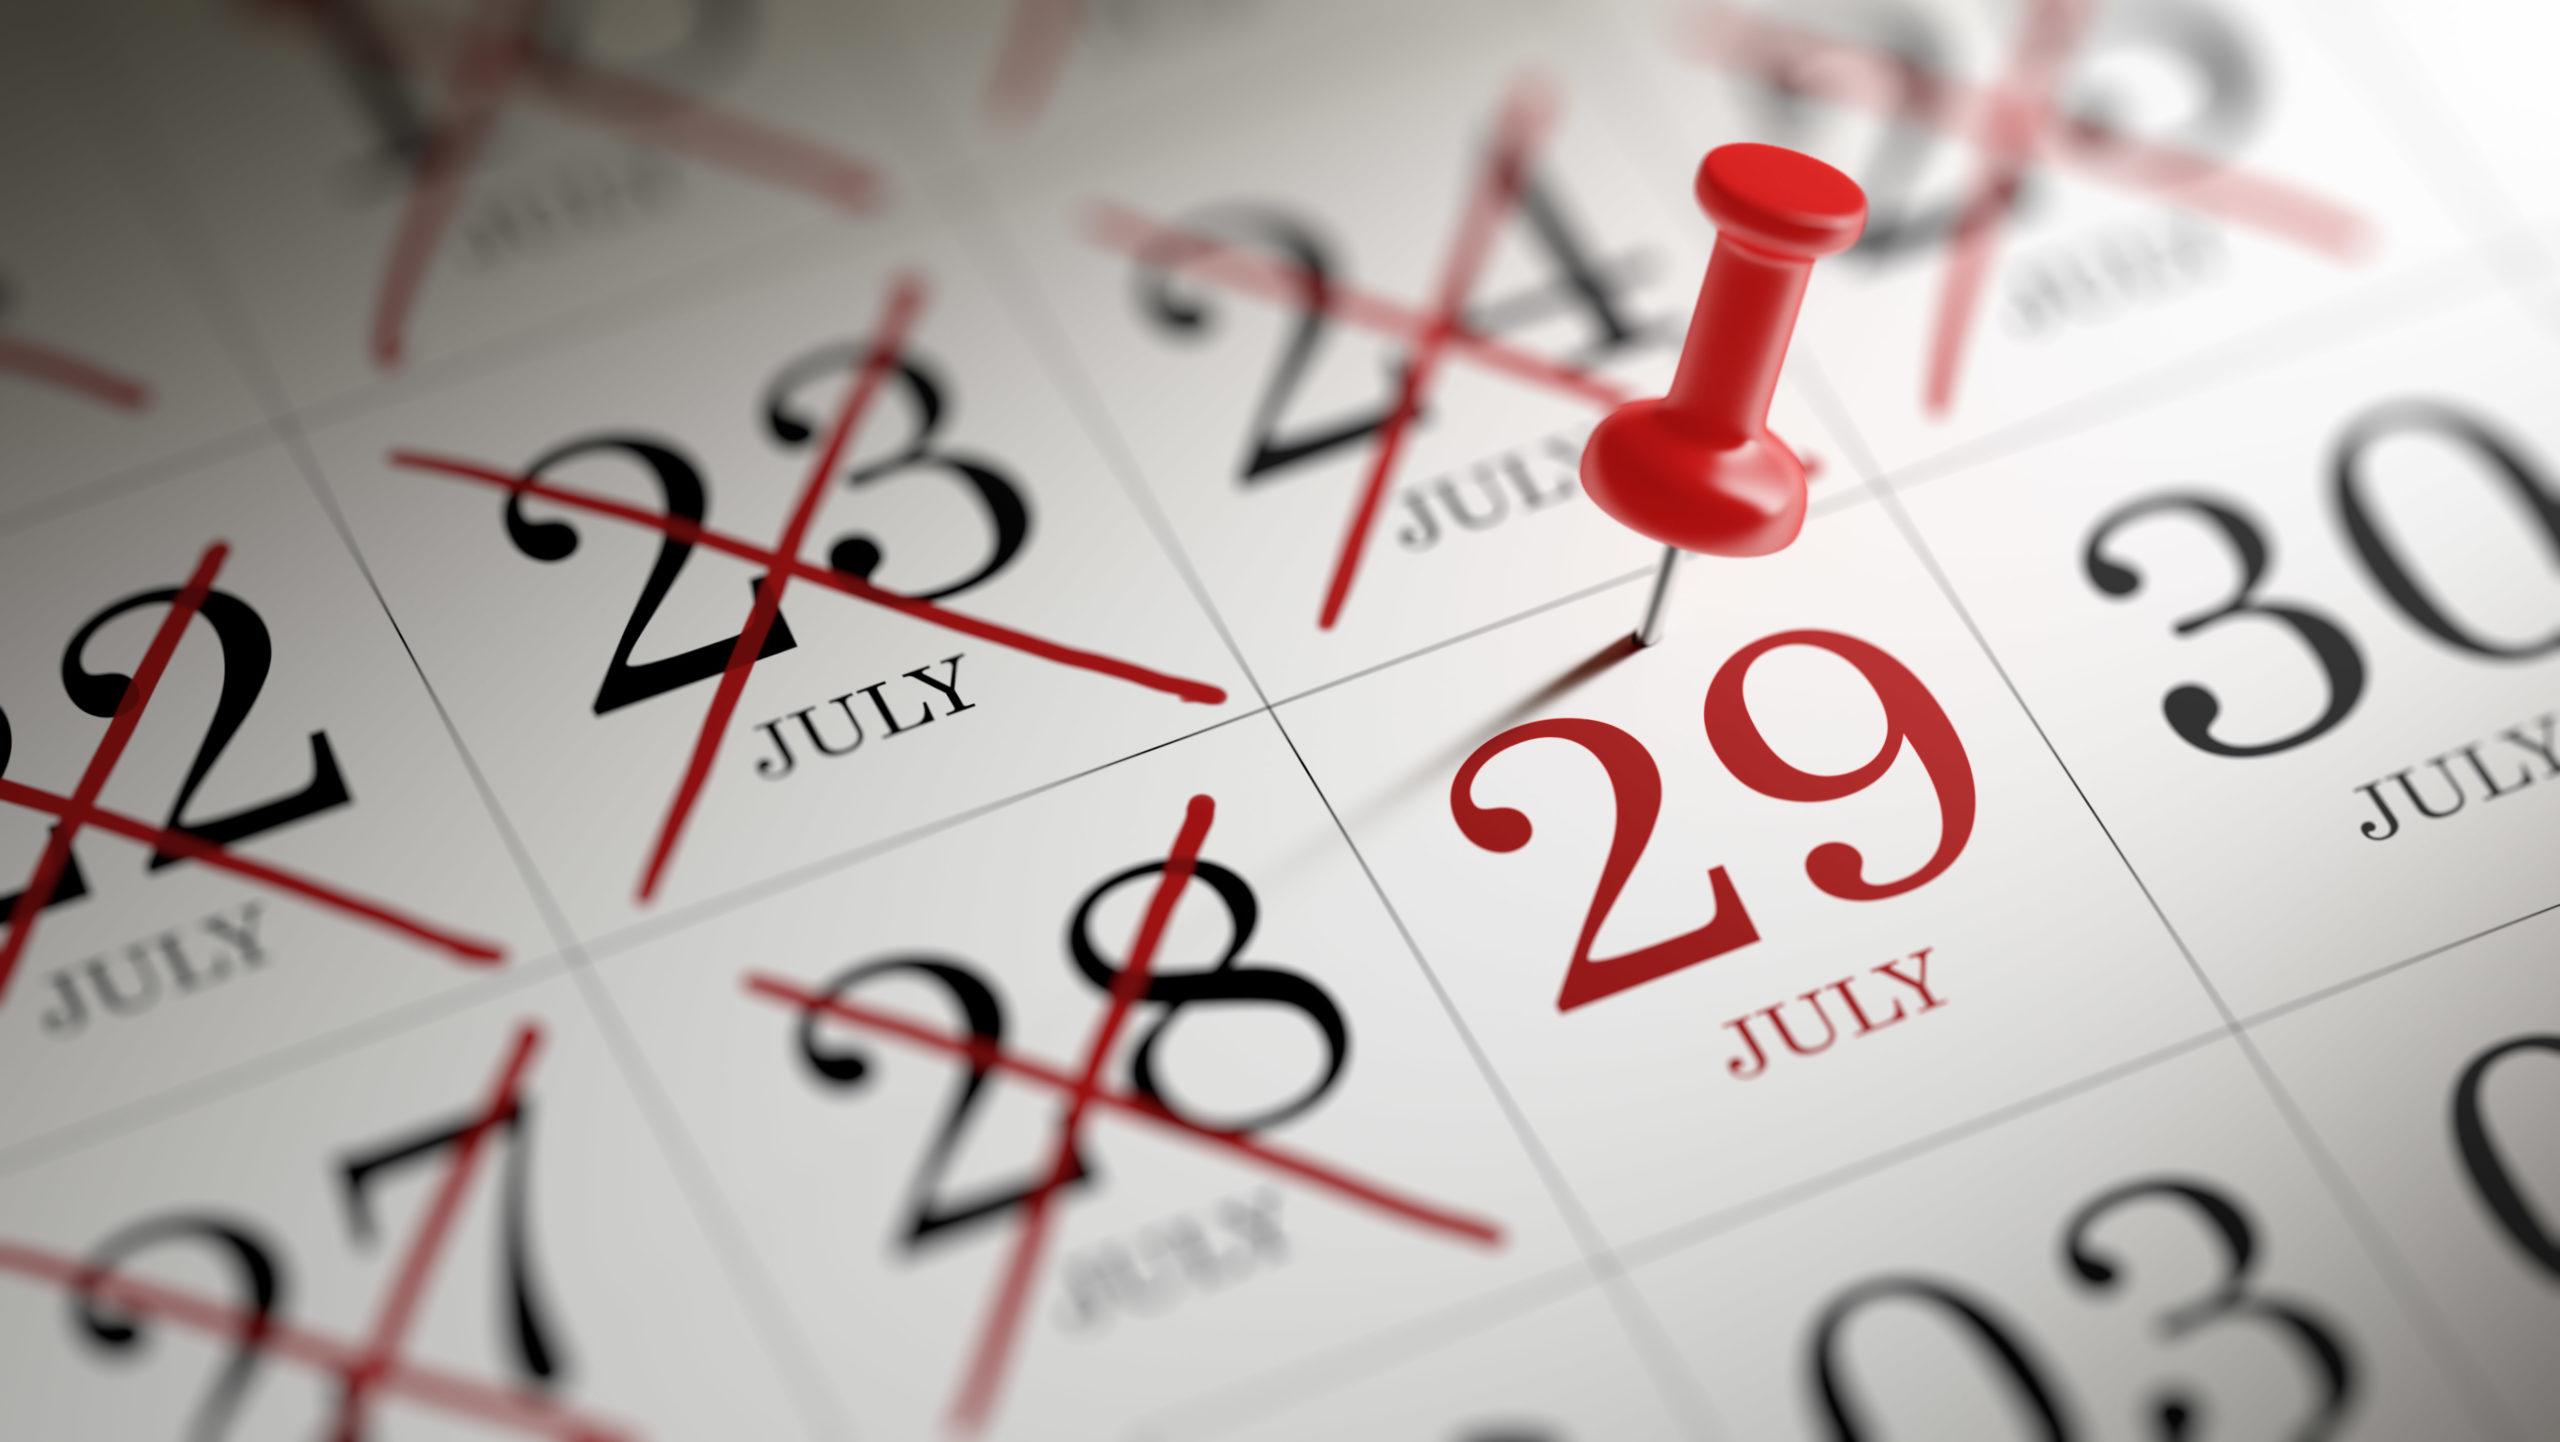 VCF New July Deadline